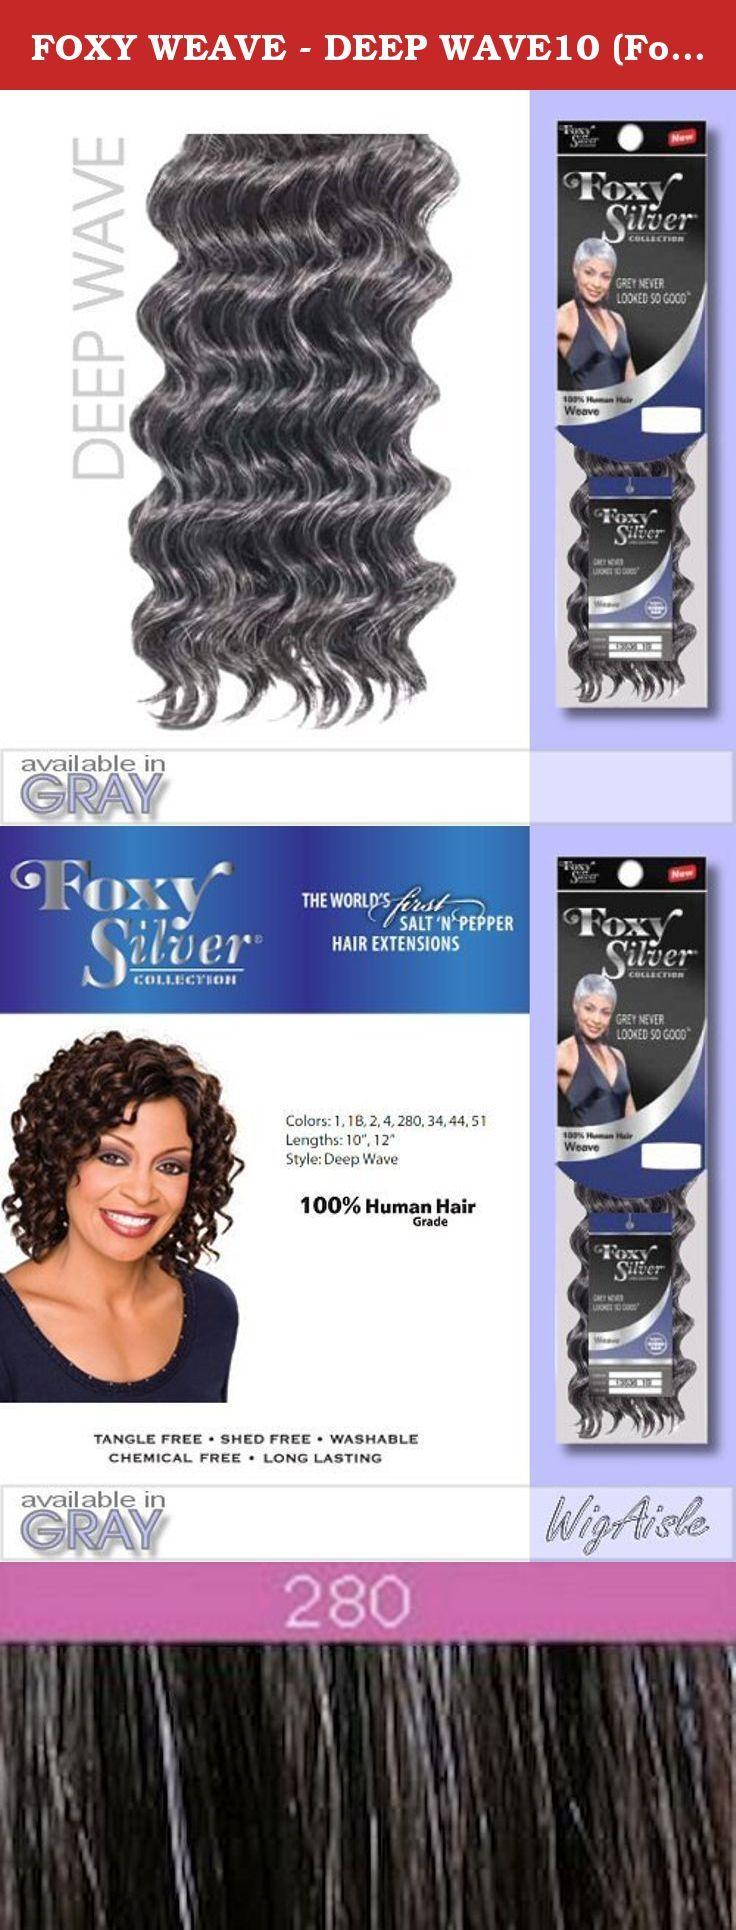 Foxy Weave Deep Wave10 Foxy Silver Human Hair Blend Weave I